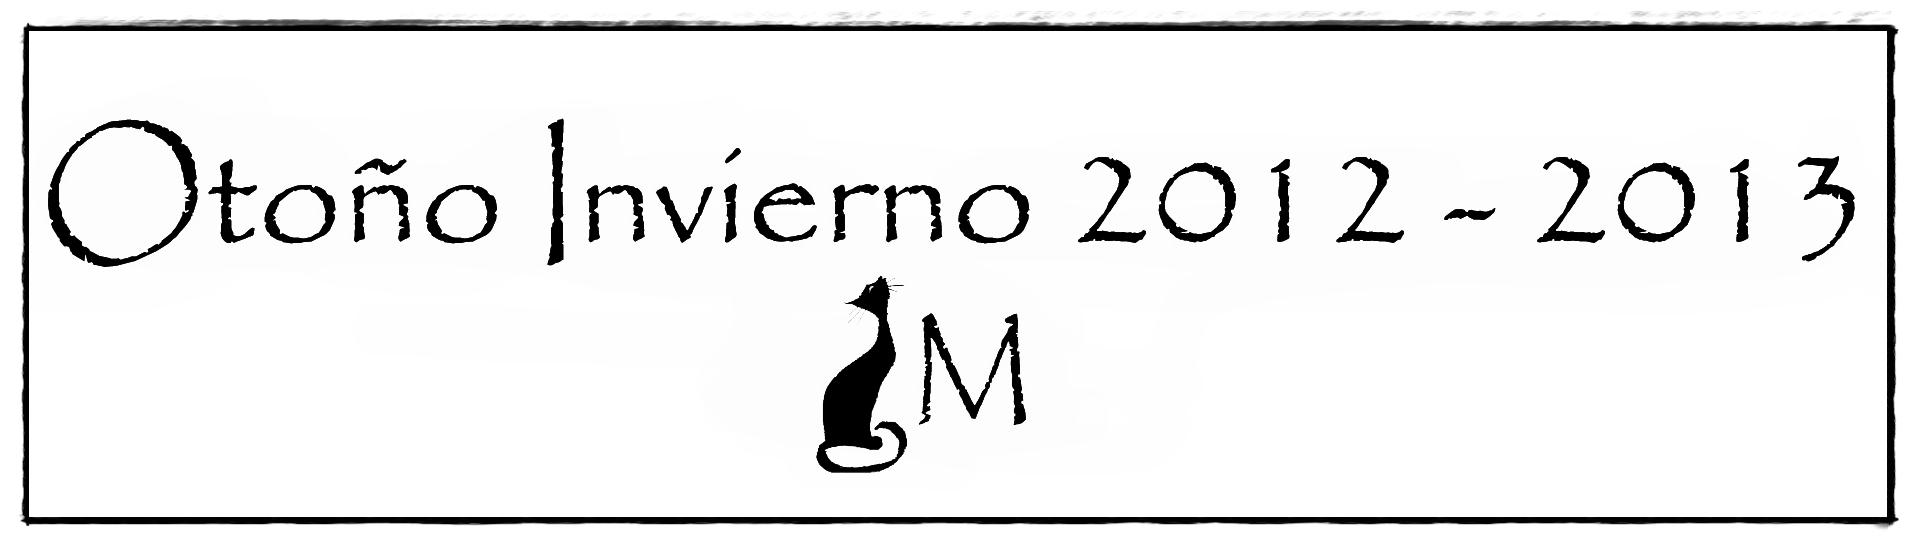 FW 2012 2013